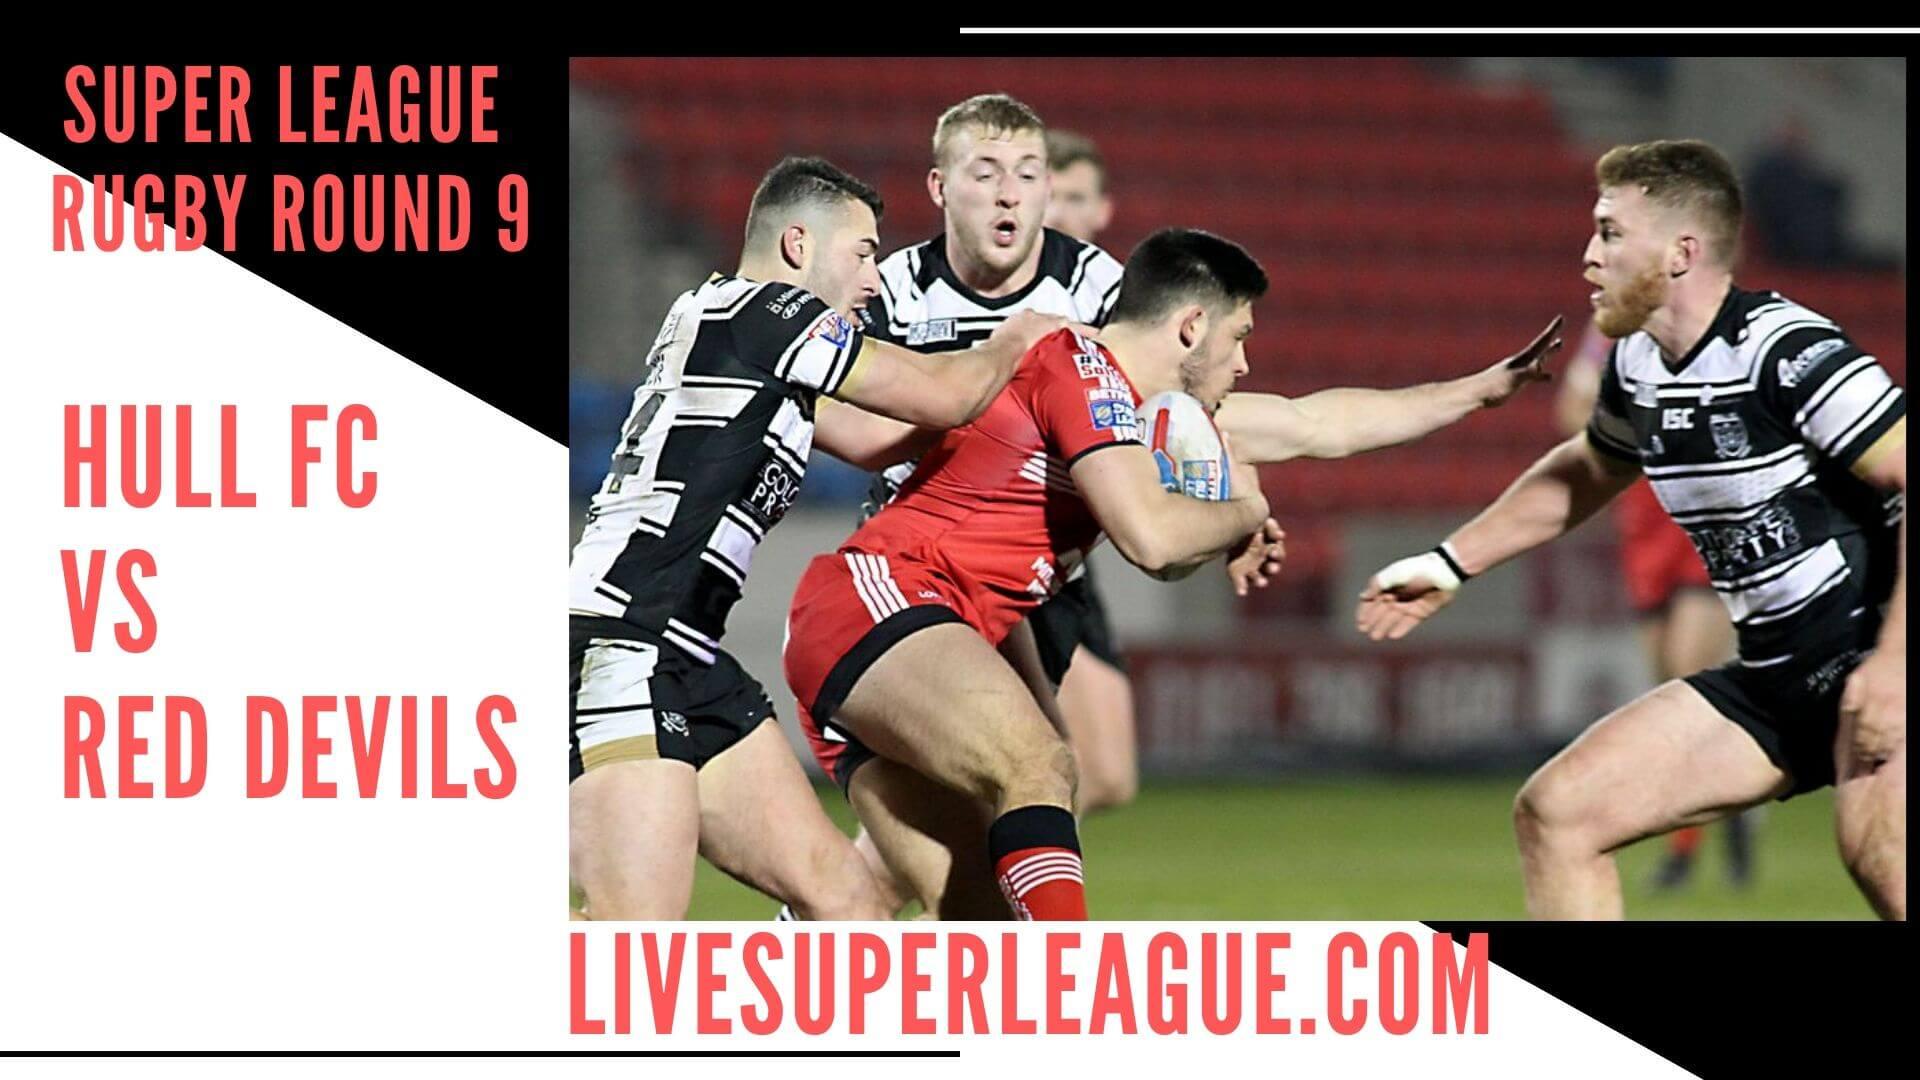 Hull Fc Vs Salford Red Devils Live Stream   Round 9